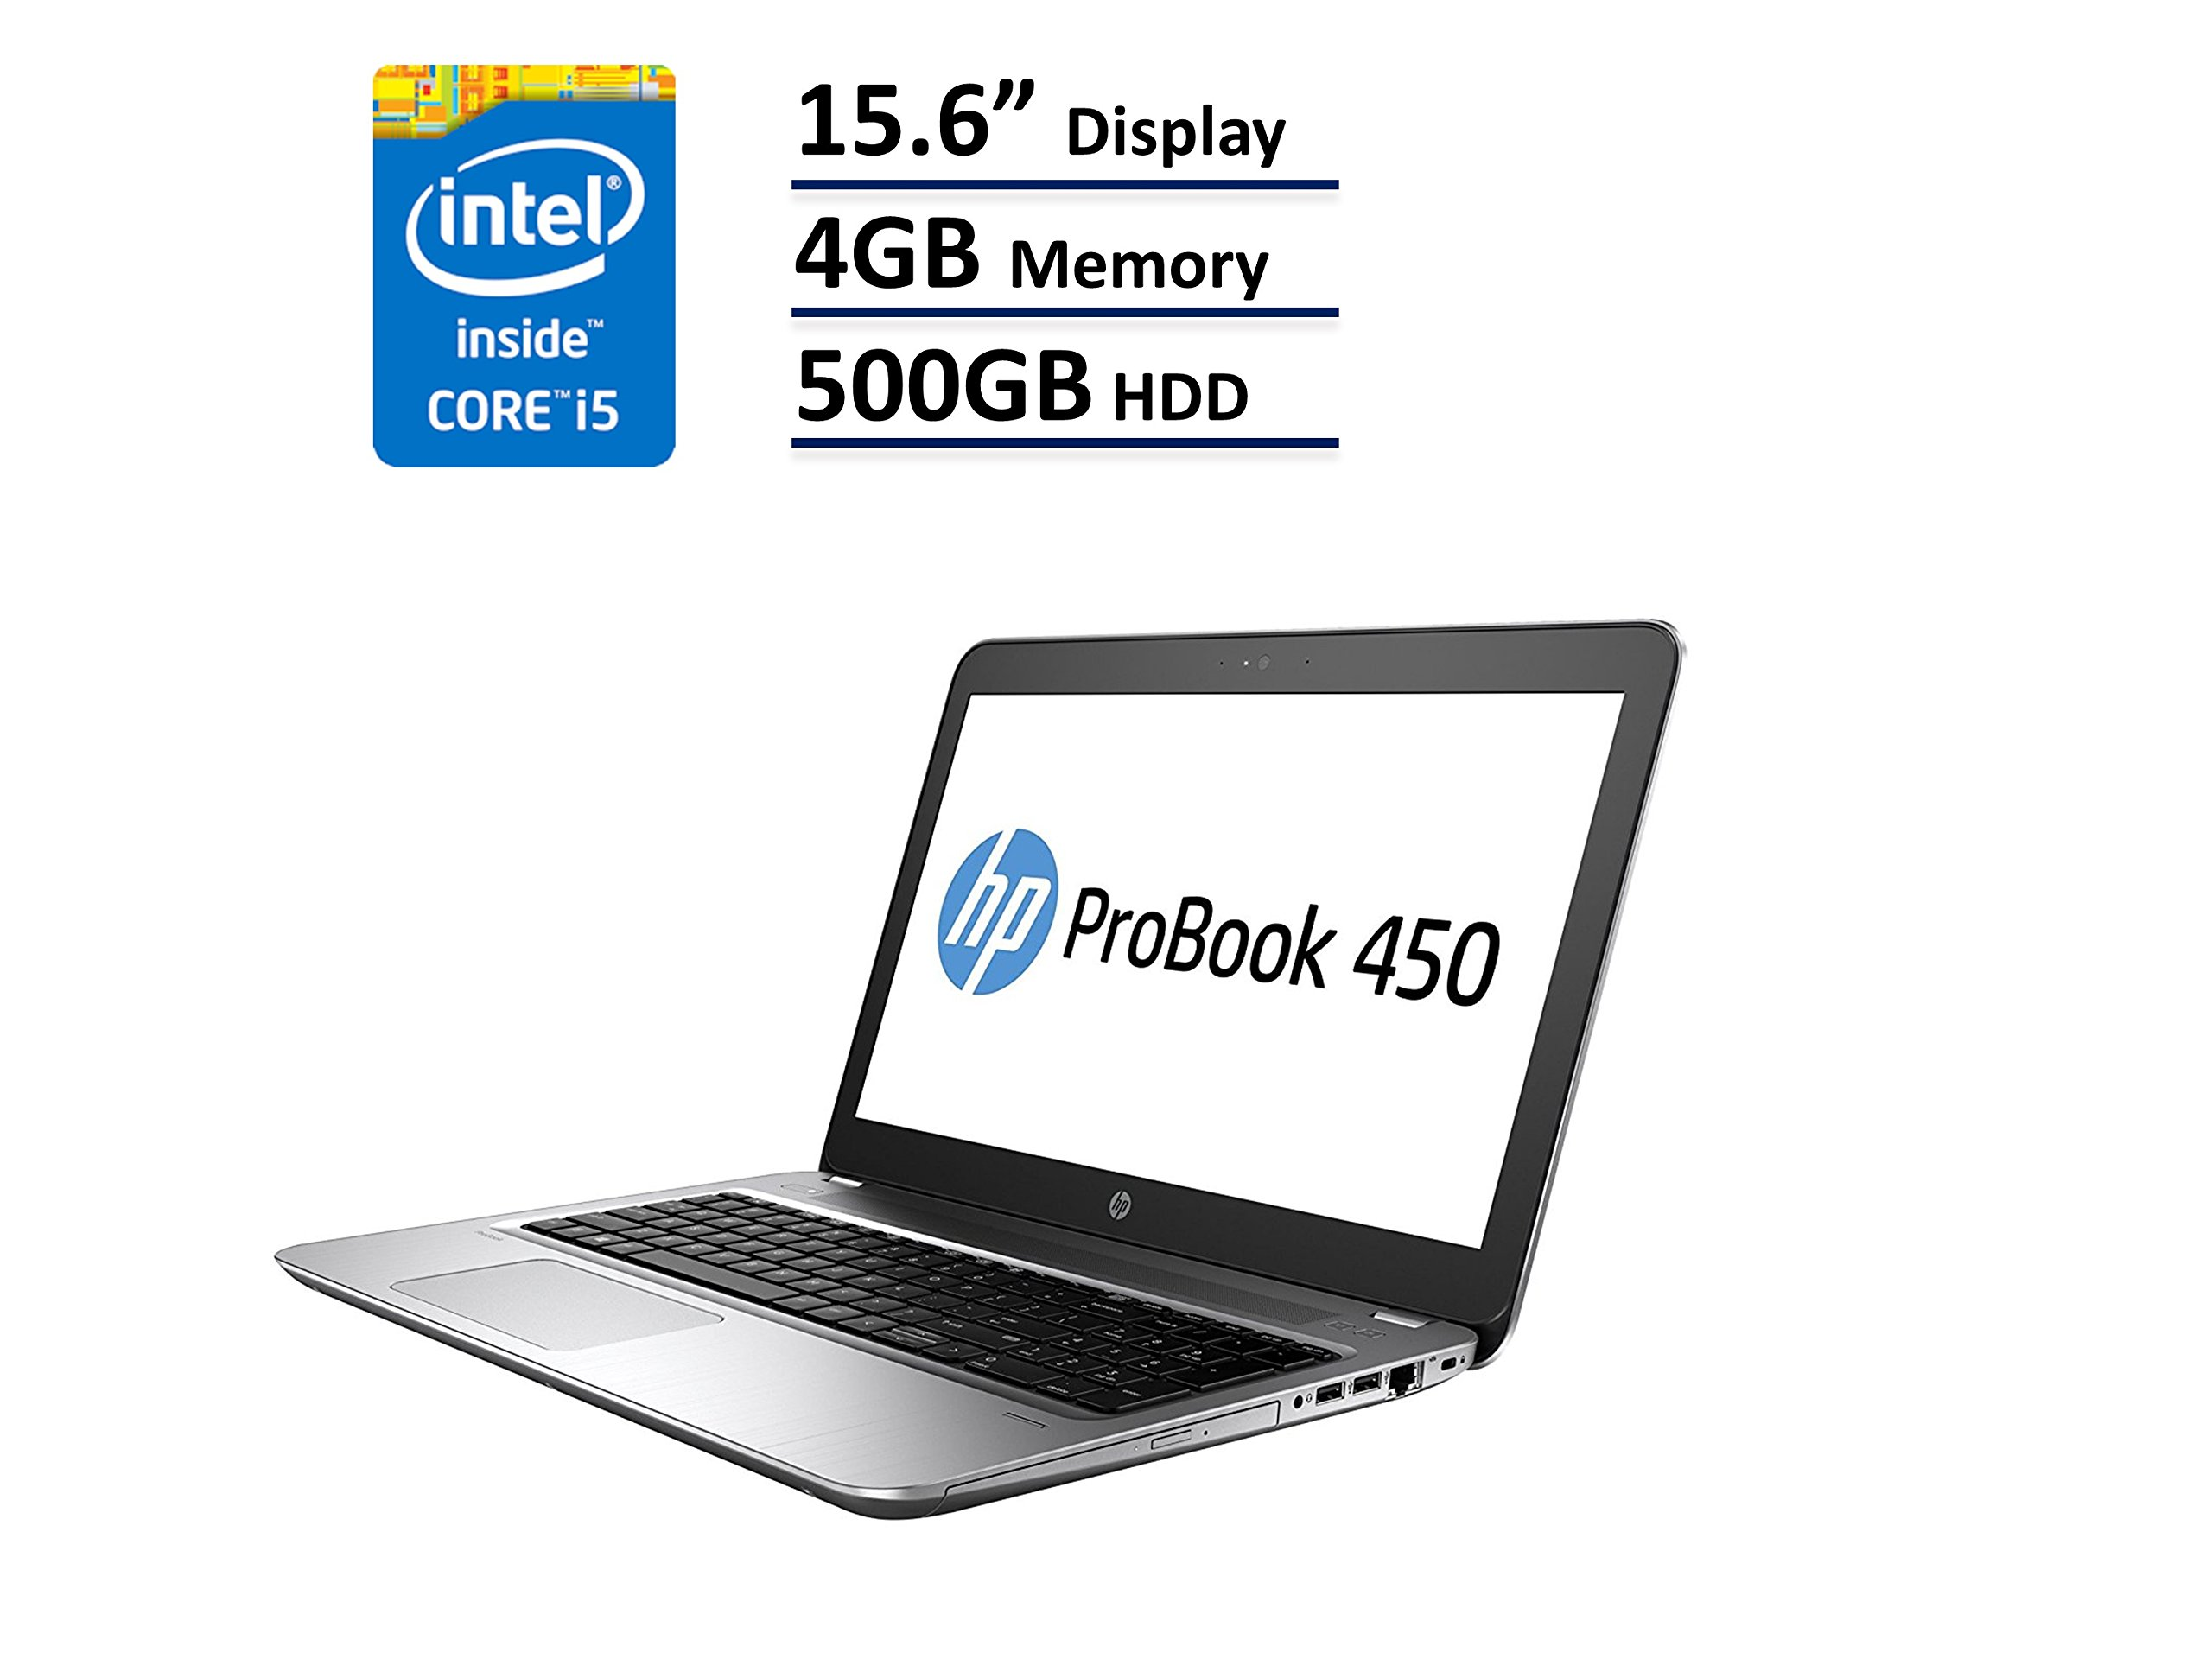 HP ProBook 450 G4 Business Ultrabook Laptop: 15.6-Inch (1366x768)   Intel Core i5-7200U   500GB HDD   4GB DDR4   DVD-RW   Windows 10 Pro